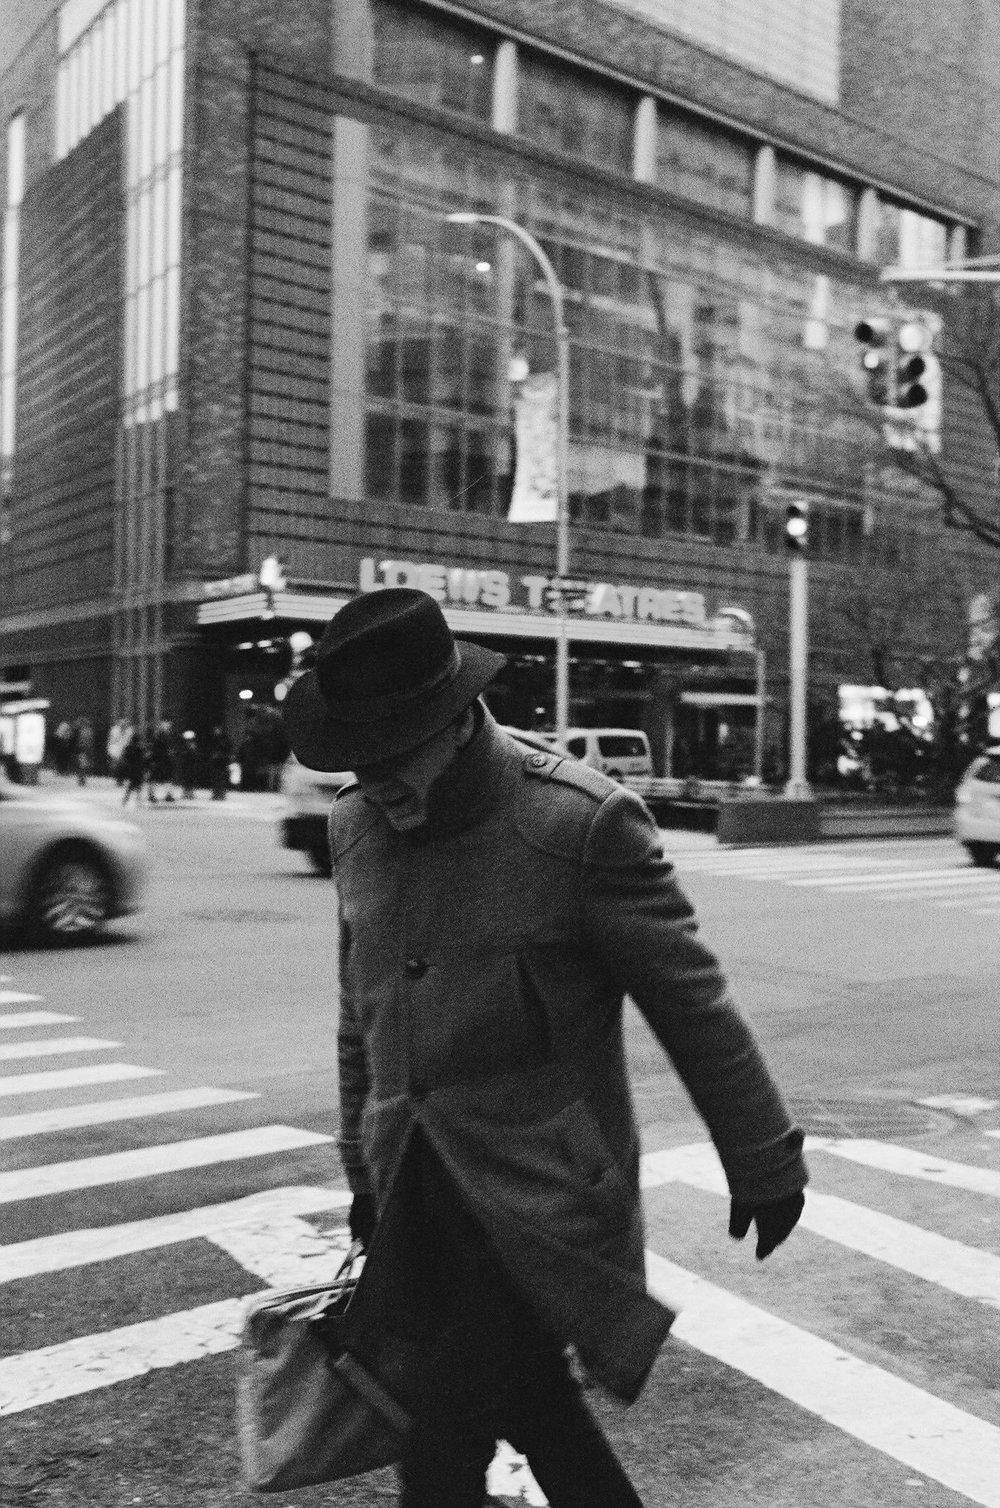 urban_street_photography_21.jpg